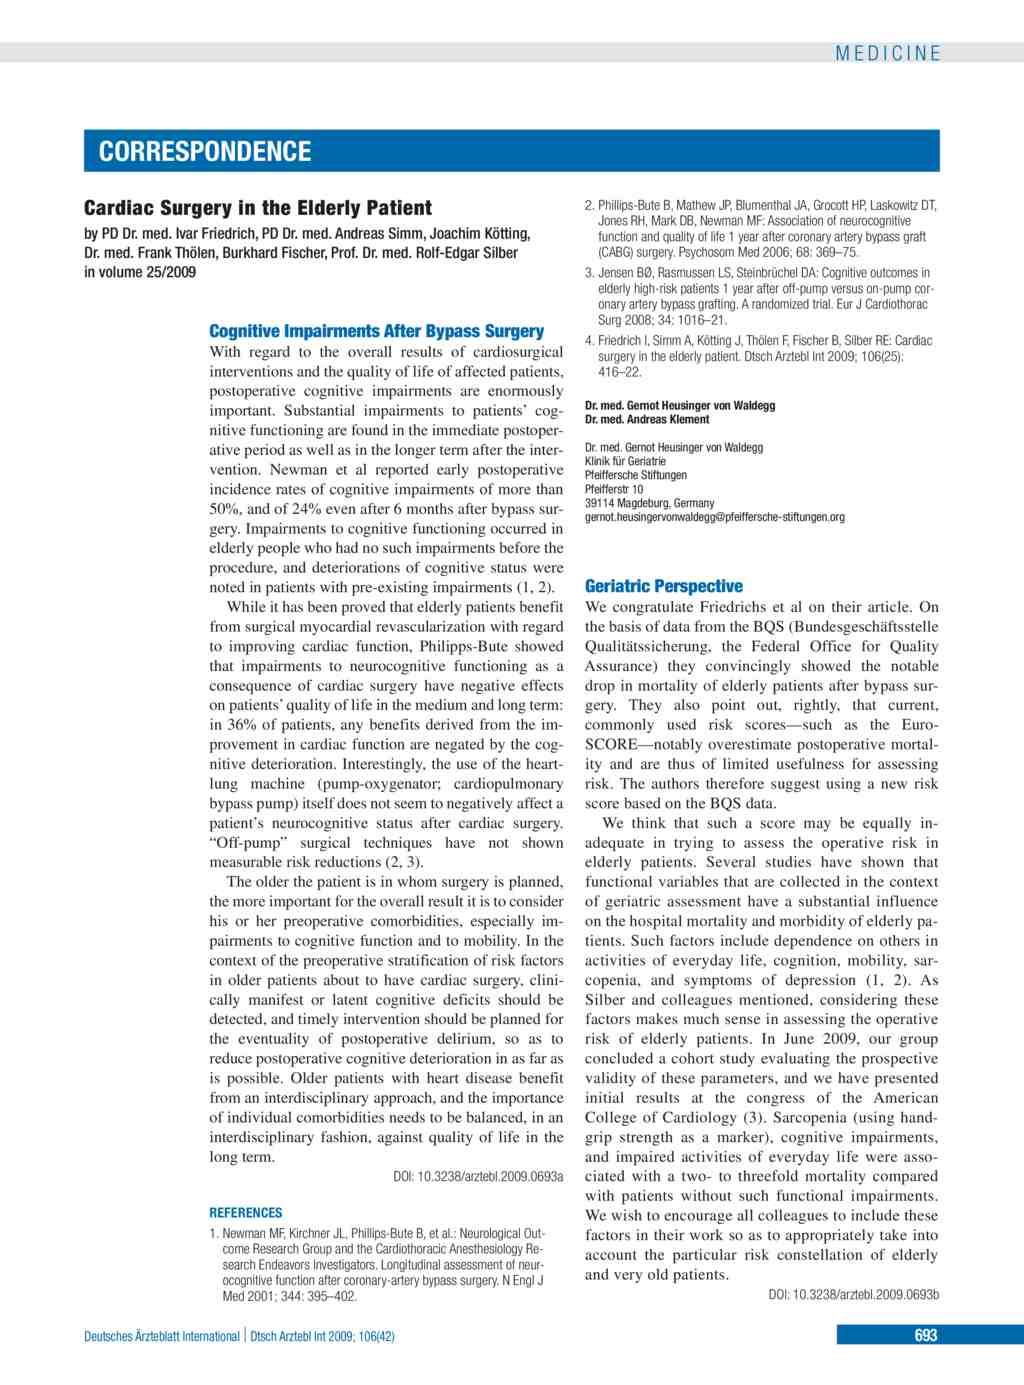 Cognitive Impairment After Bypass Surgery